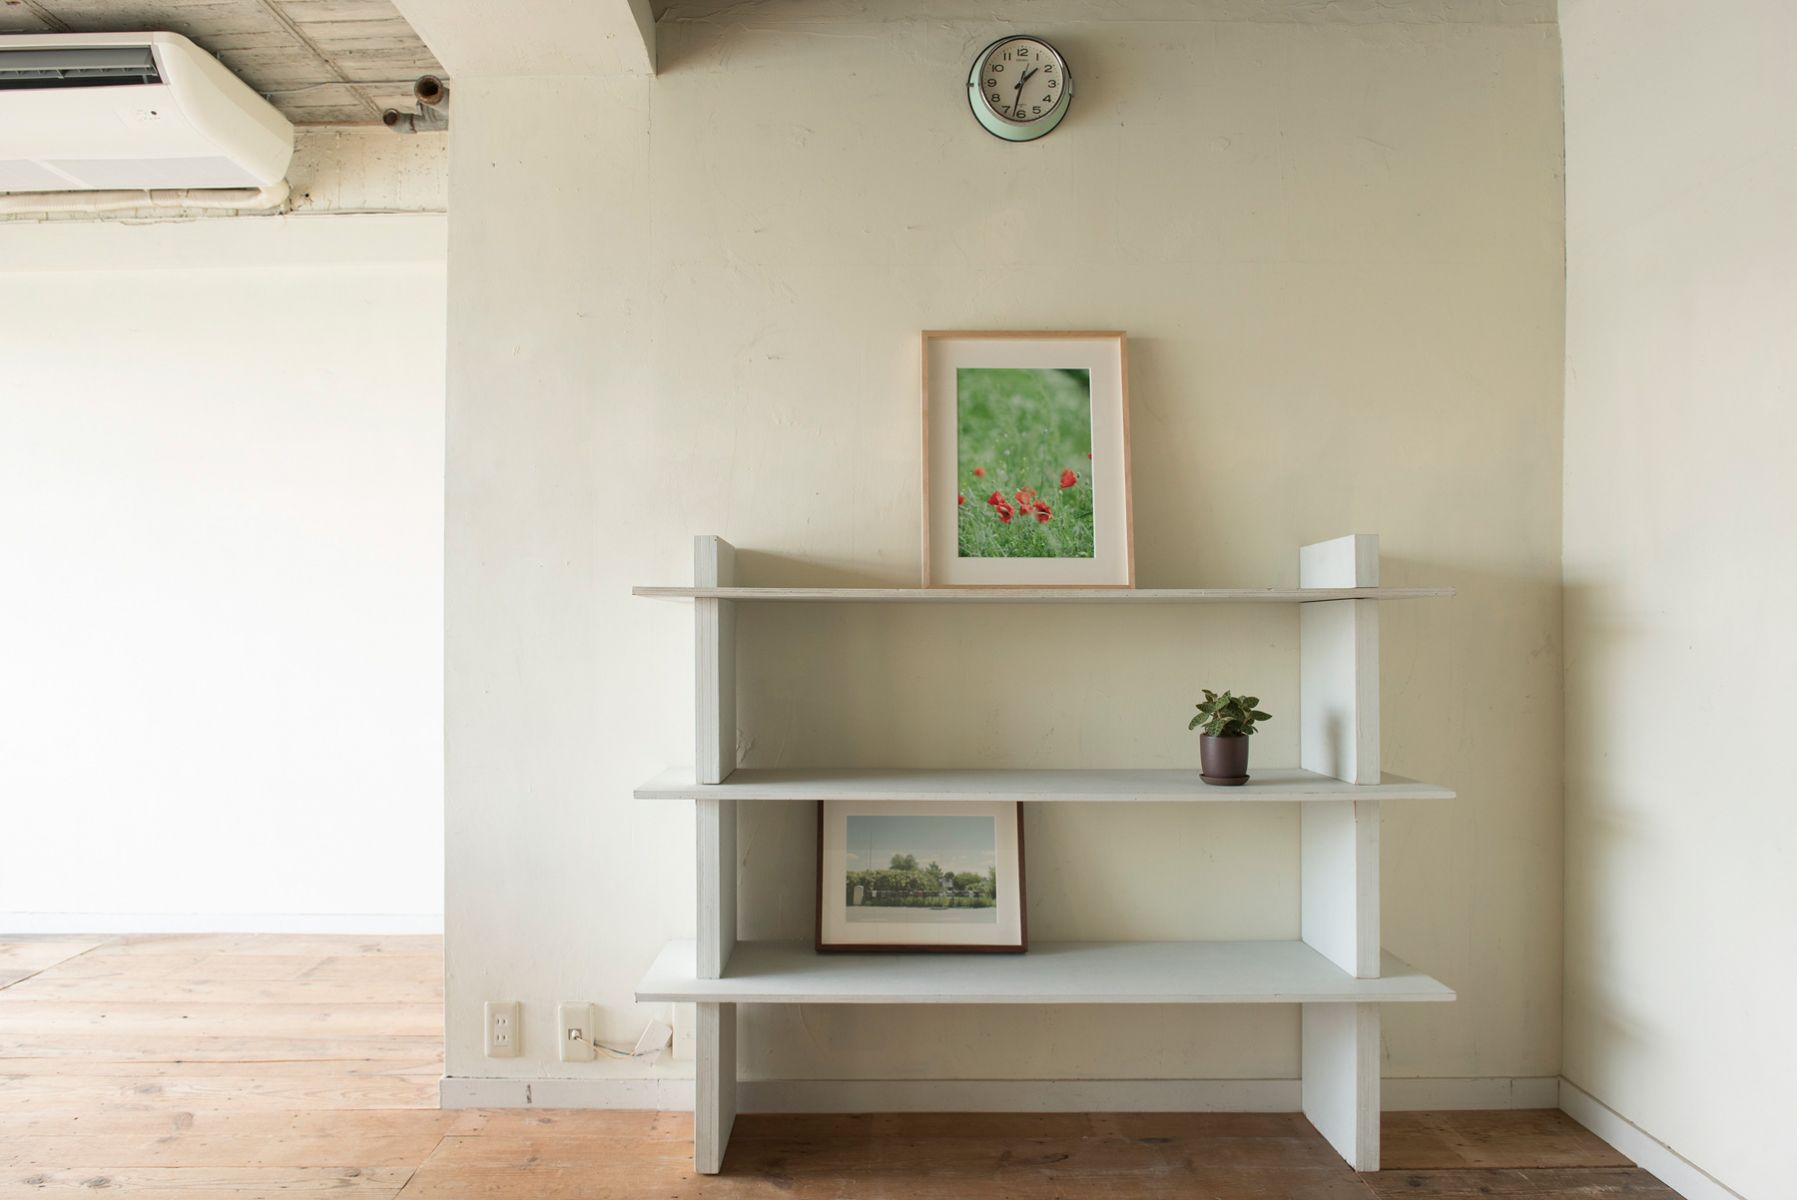 salvia cobaco(サルビア コバコ)組立て式の棚